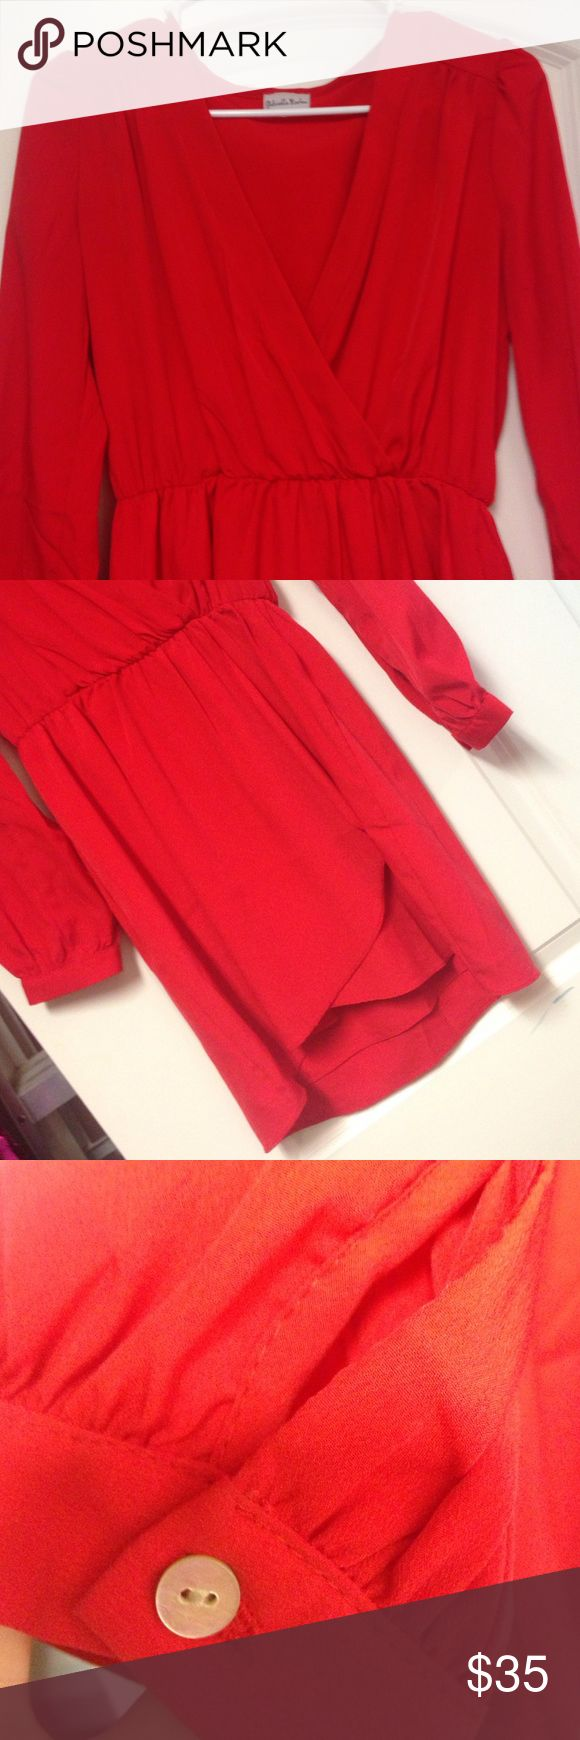 Gabriella Rocha Dress Super cute!! M/L. Gabriella Rocha. Only worn once! Gabriella Rocha Dresses Long Sleeve